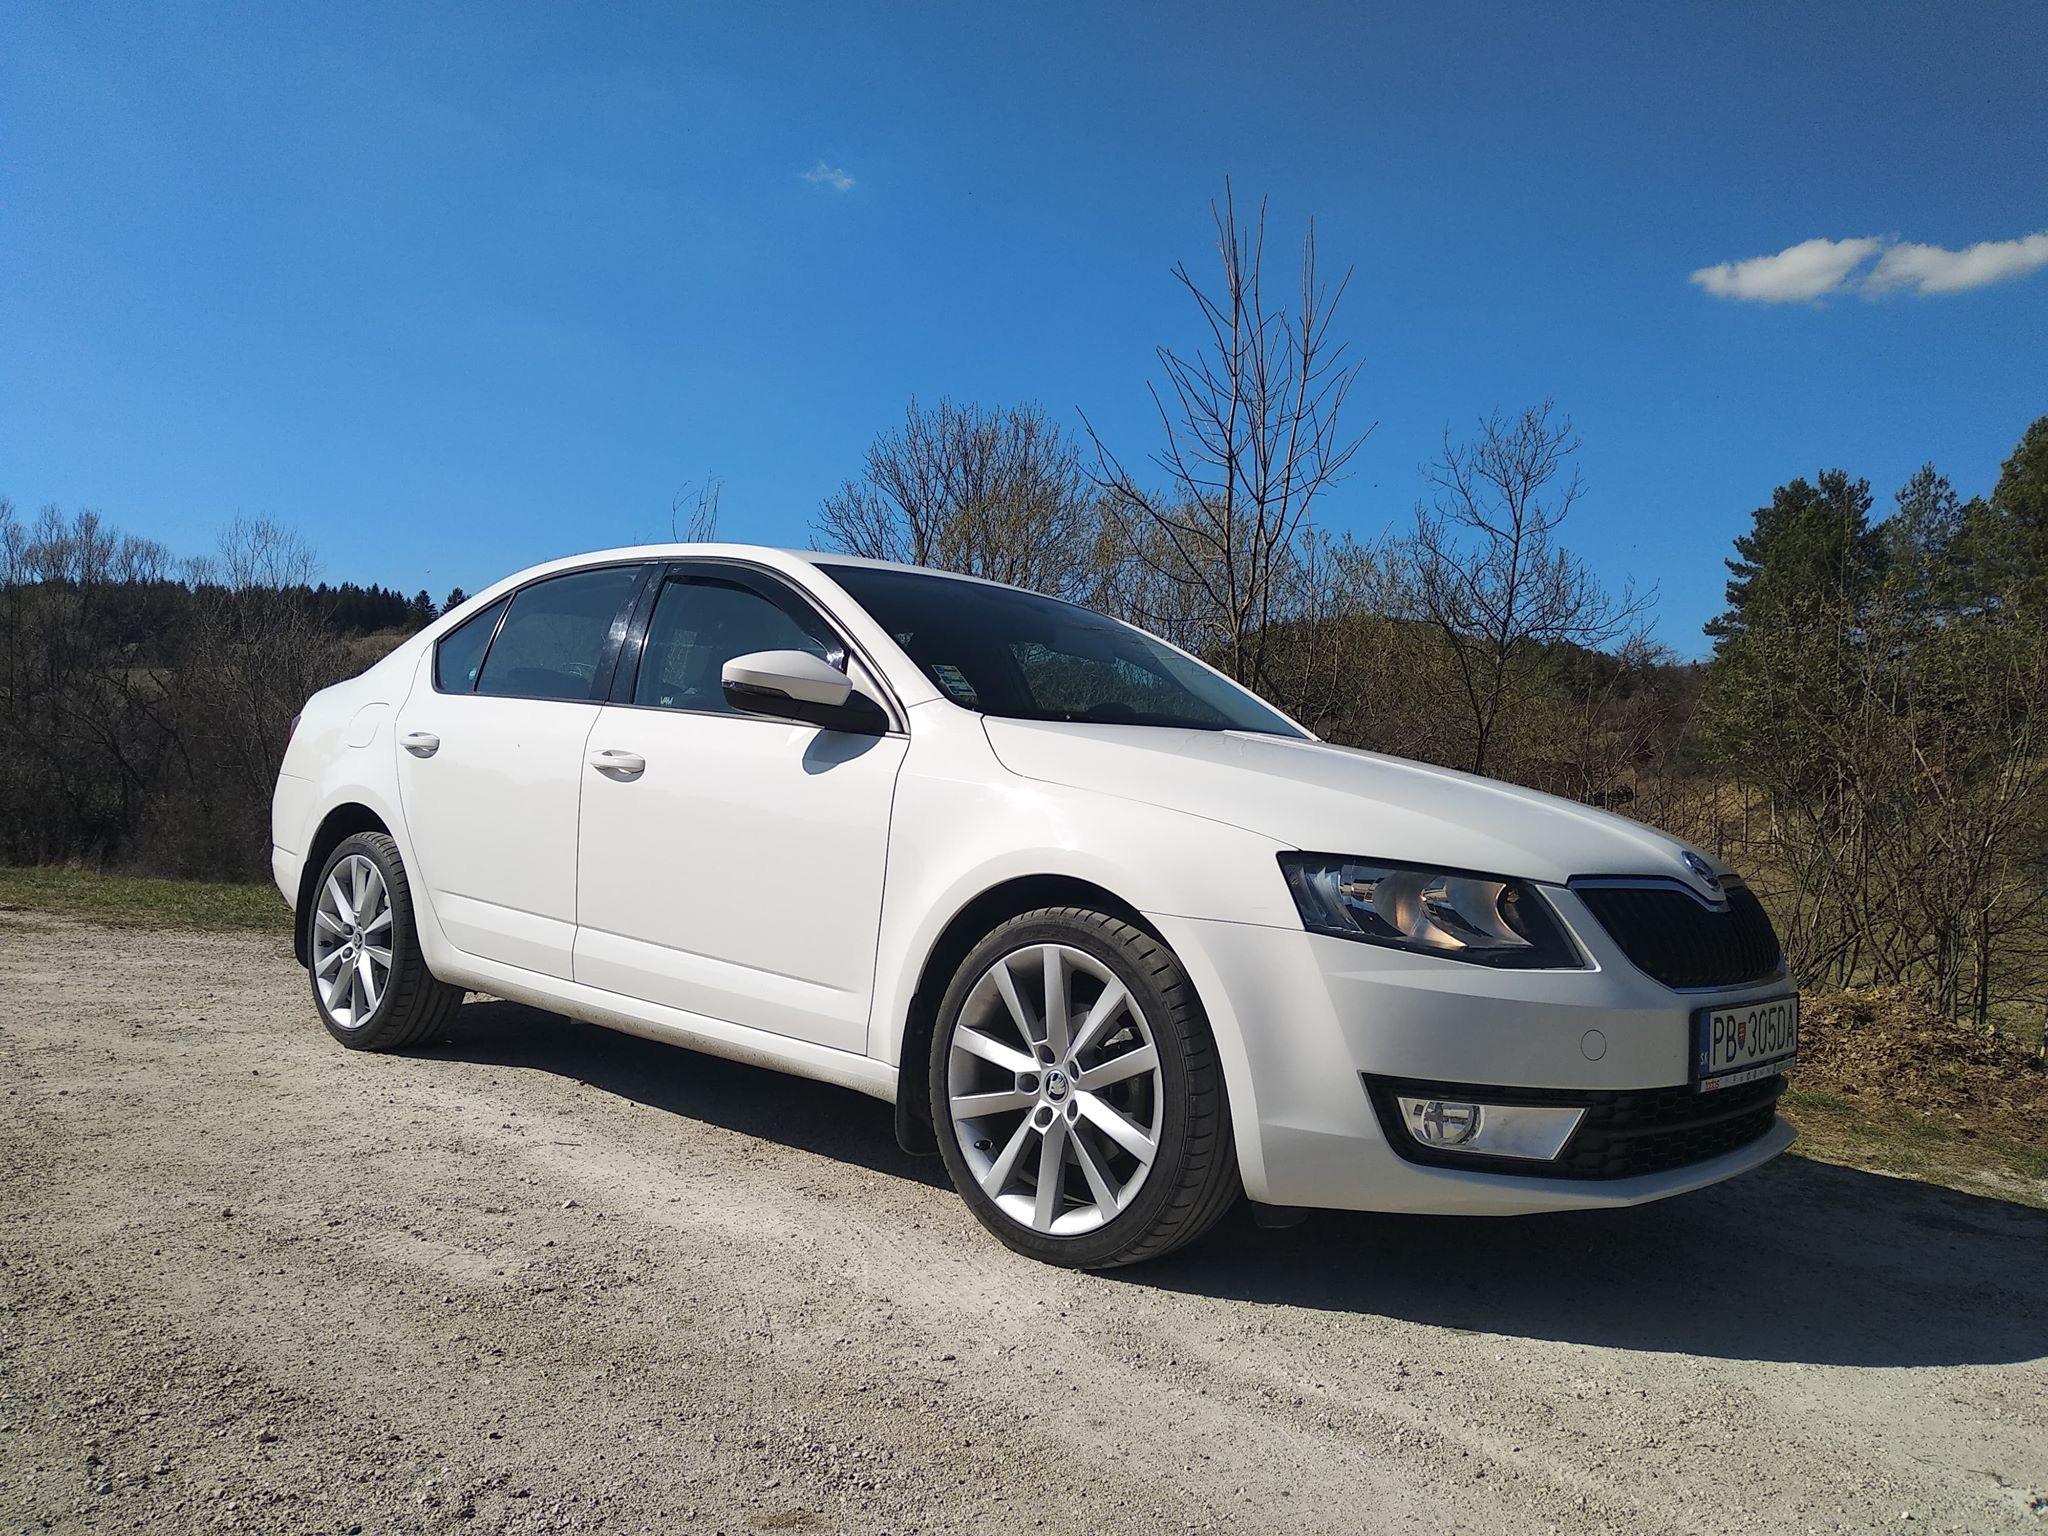 Škoda Octavia 1.6 TDI 3. gen. recenzia skúsenosti